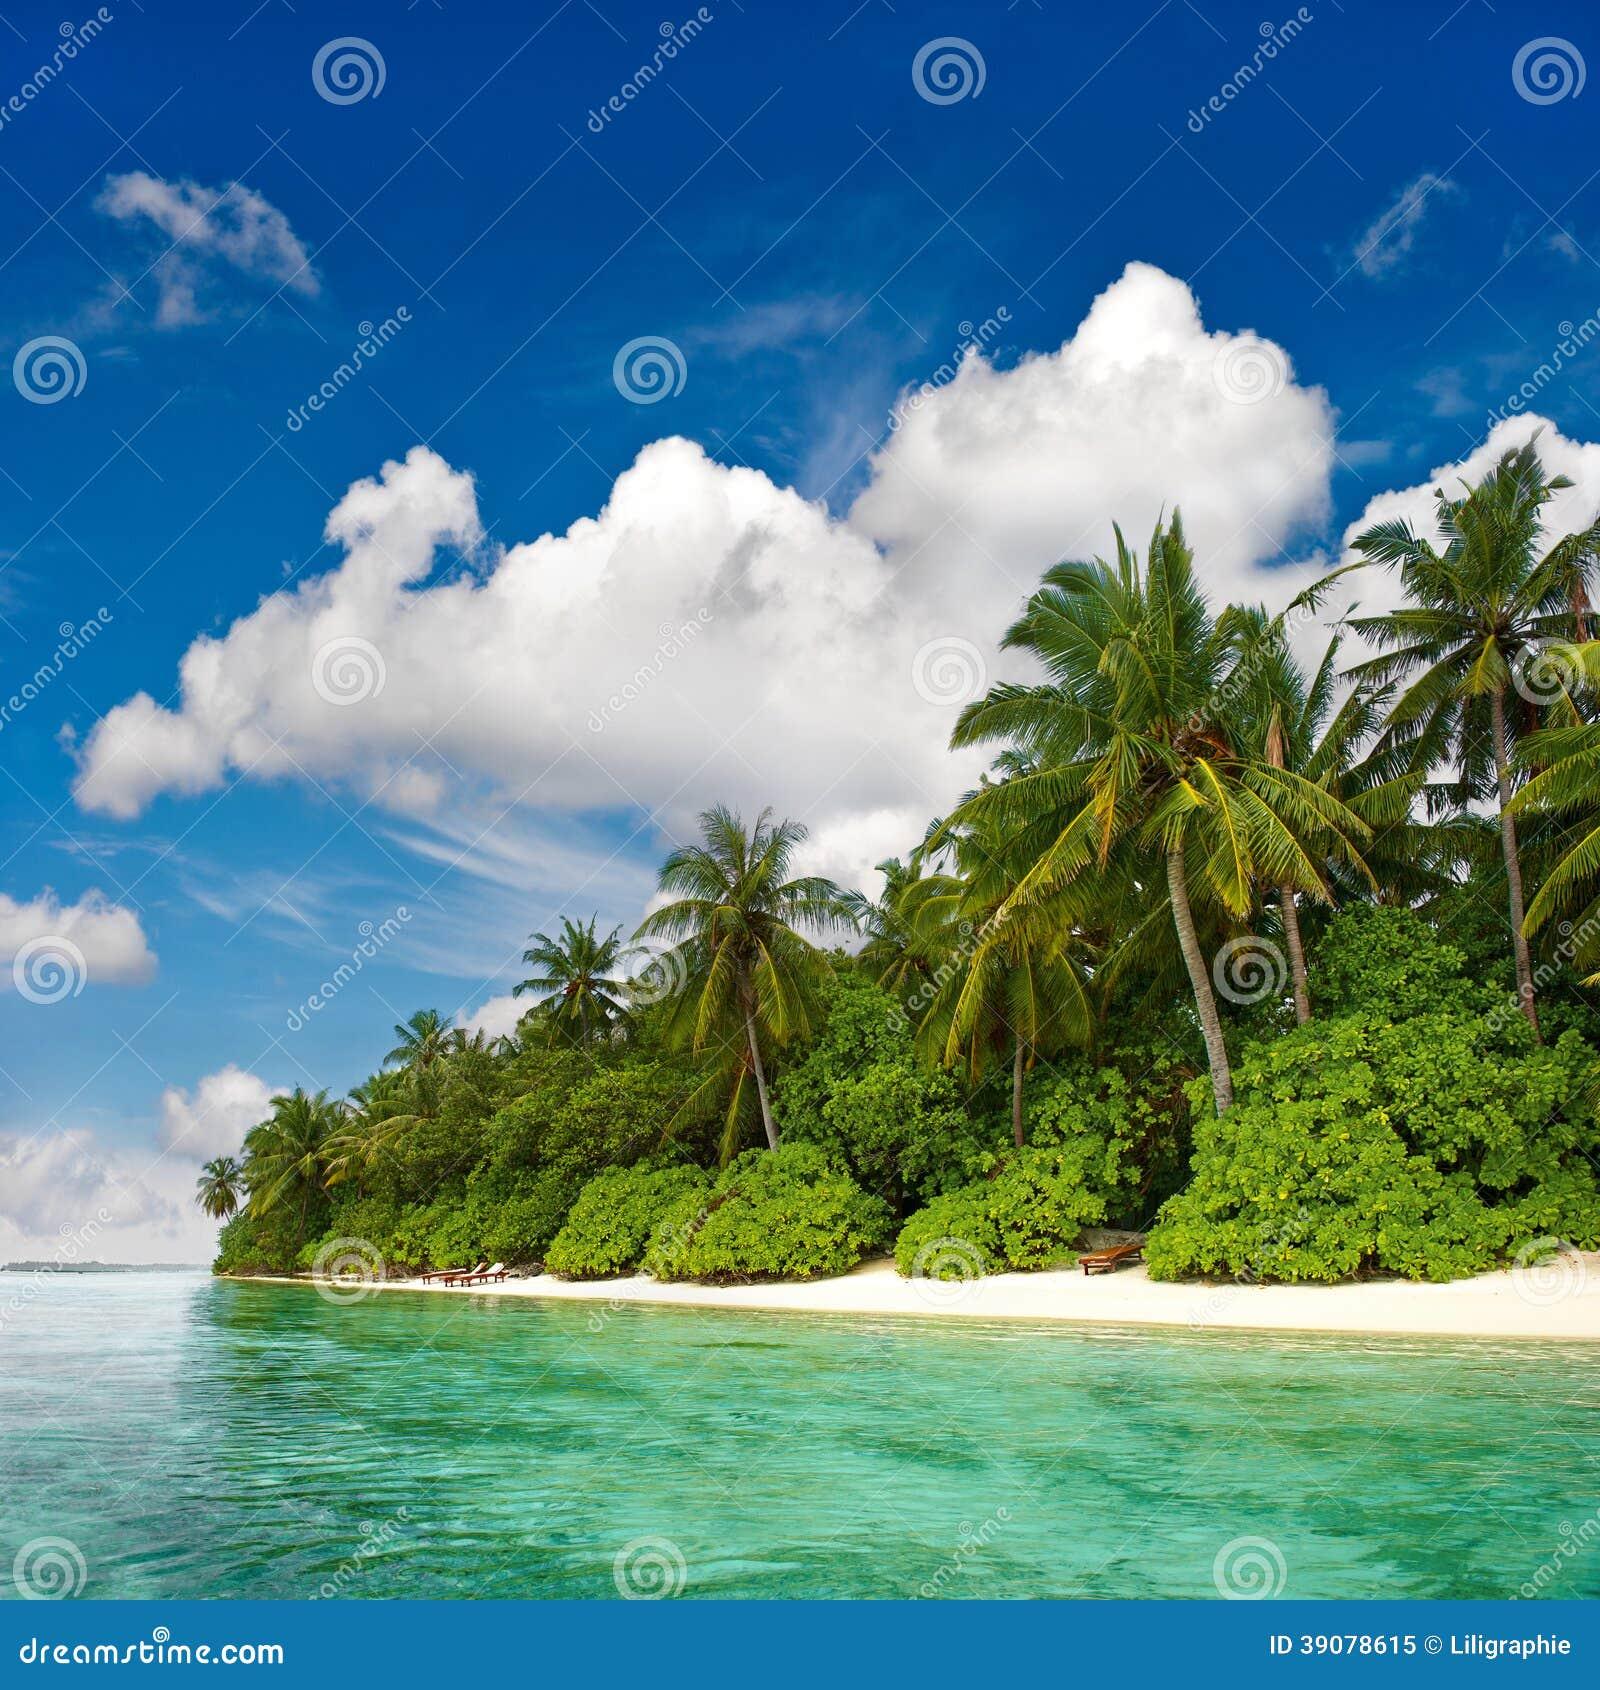 Tropical Beaches: Landscape Of Tropical Island Beach Stock Image